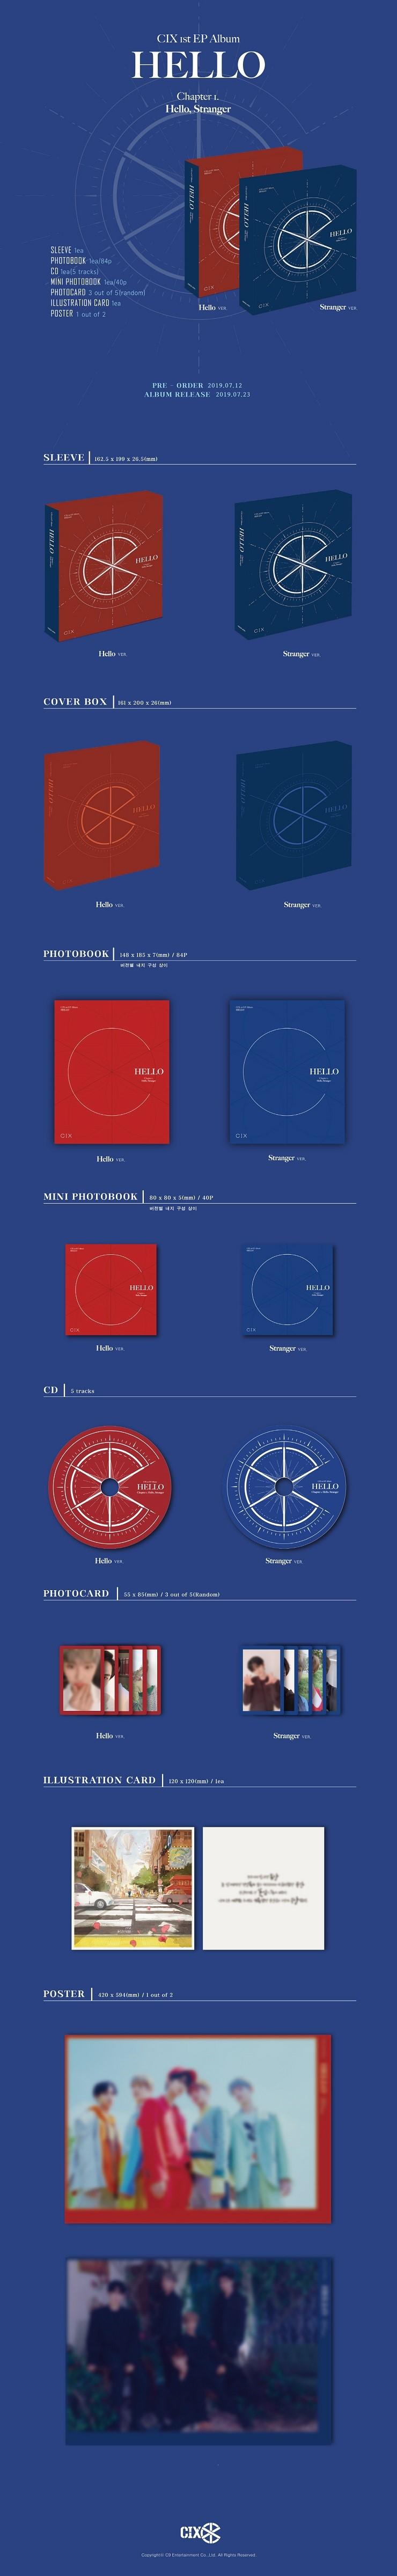 CIX(씨아이엑스) - HELLO Chapter 1. HELLO, STRANGER